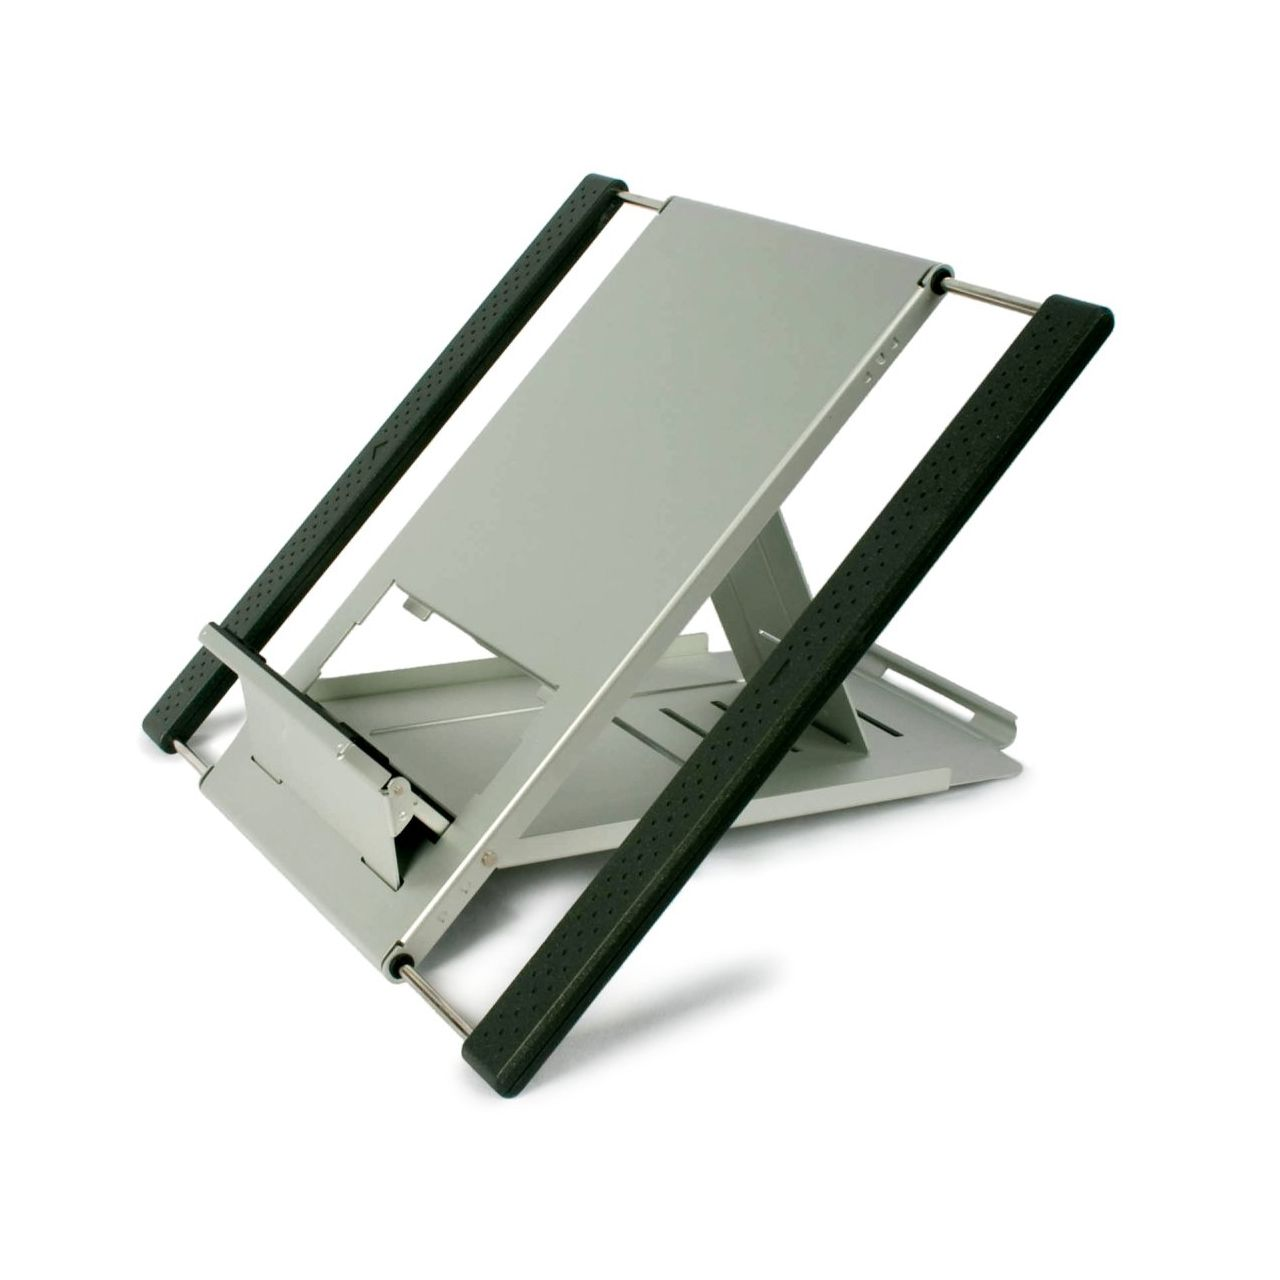 Ergostar laptopstand flexible laptophouder ERKASC01 0011s 0002 Schuin